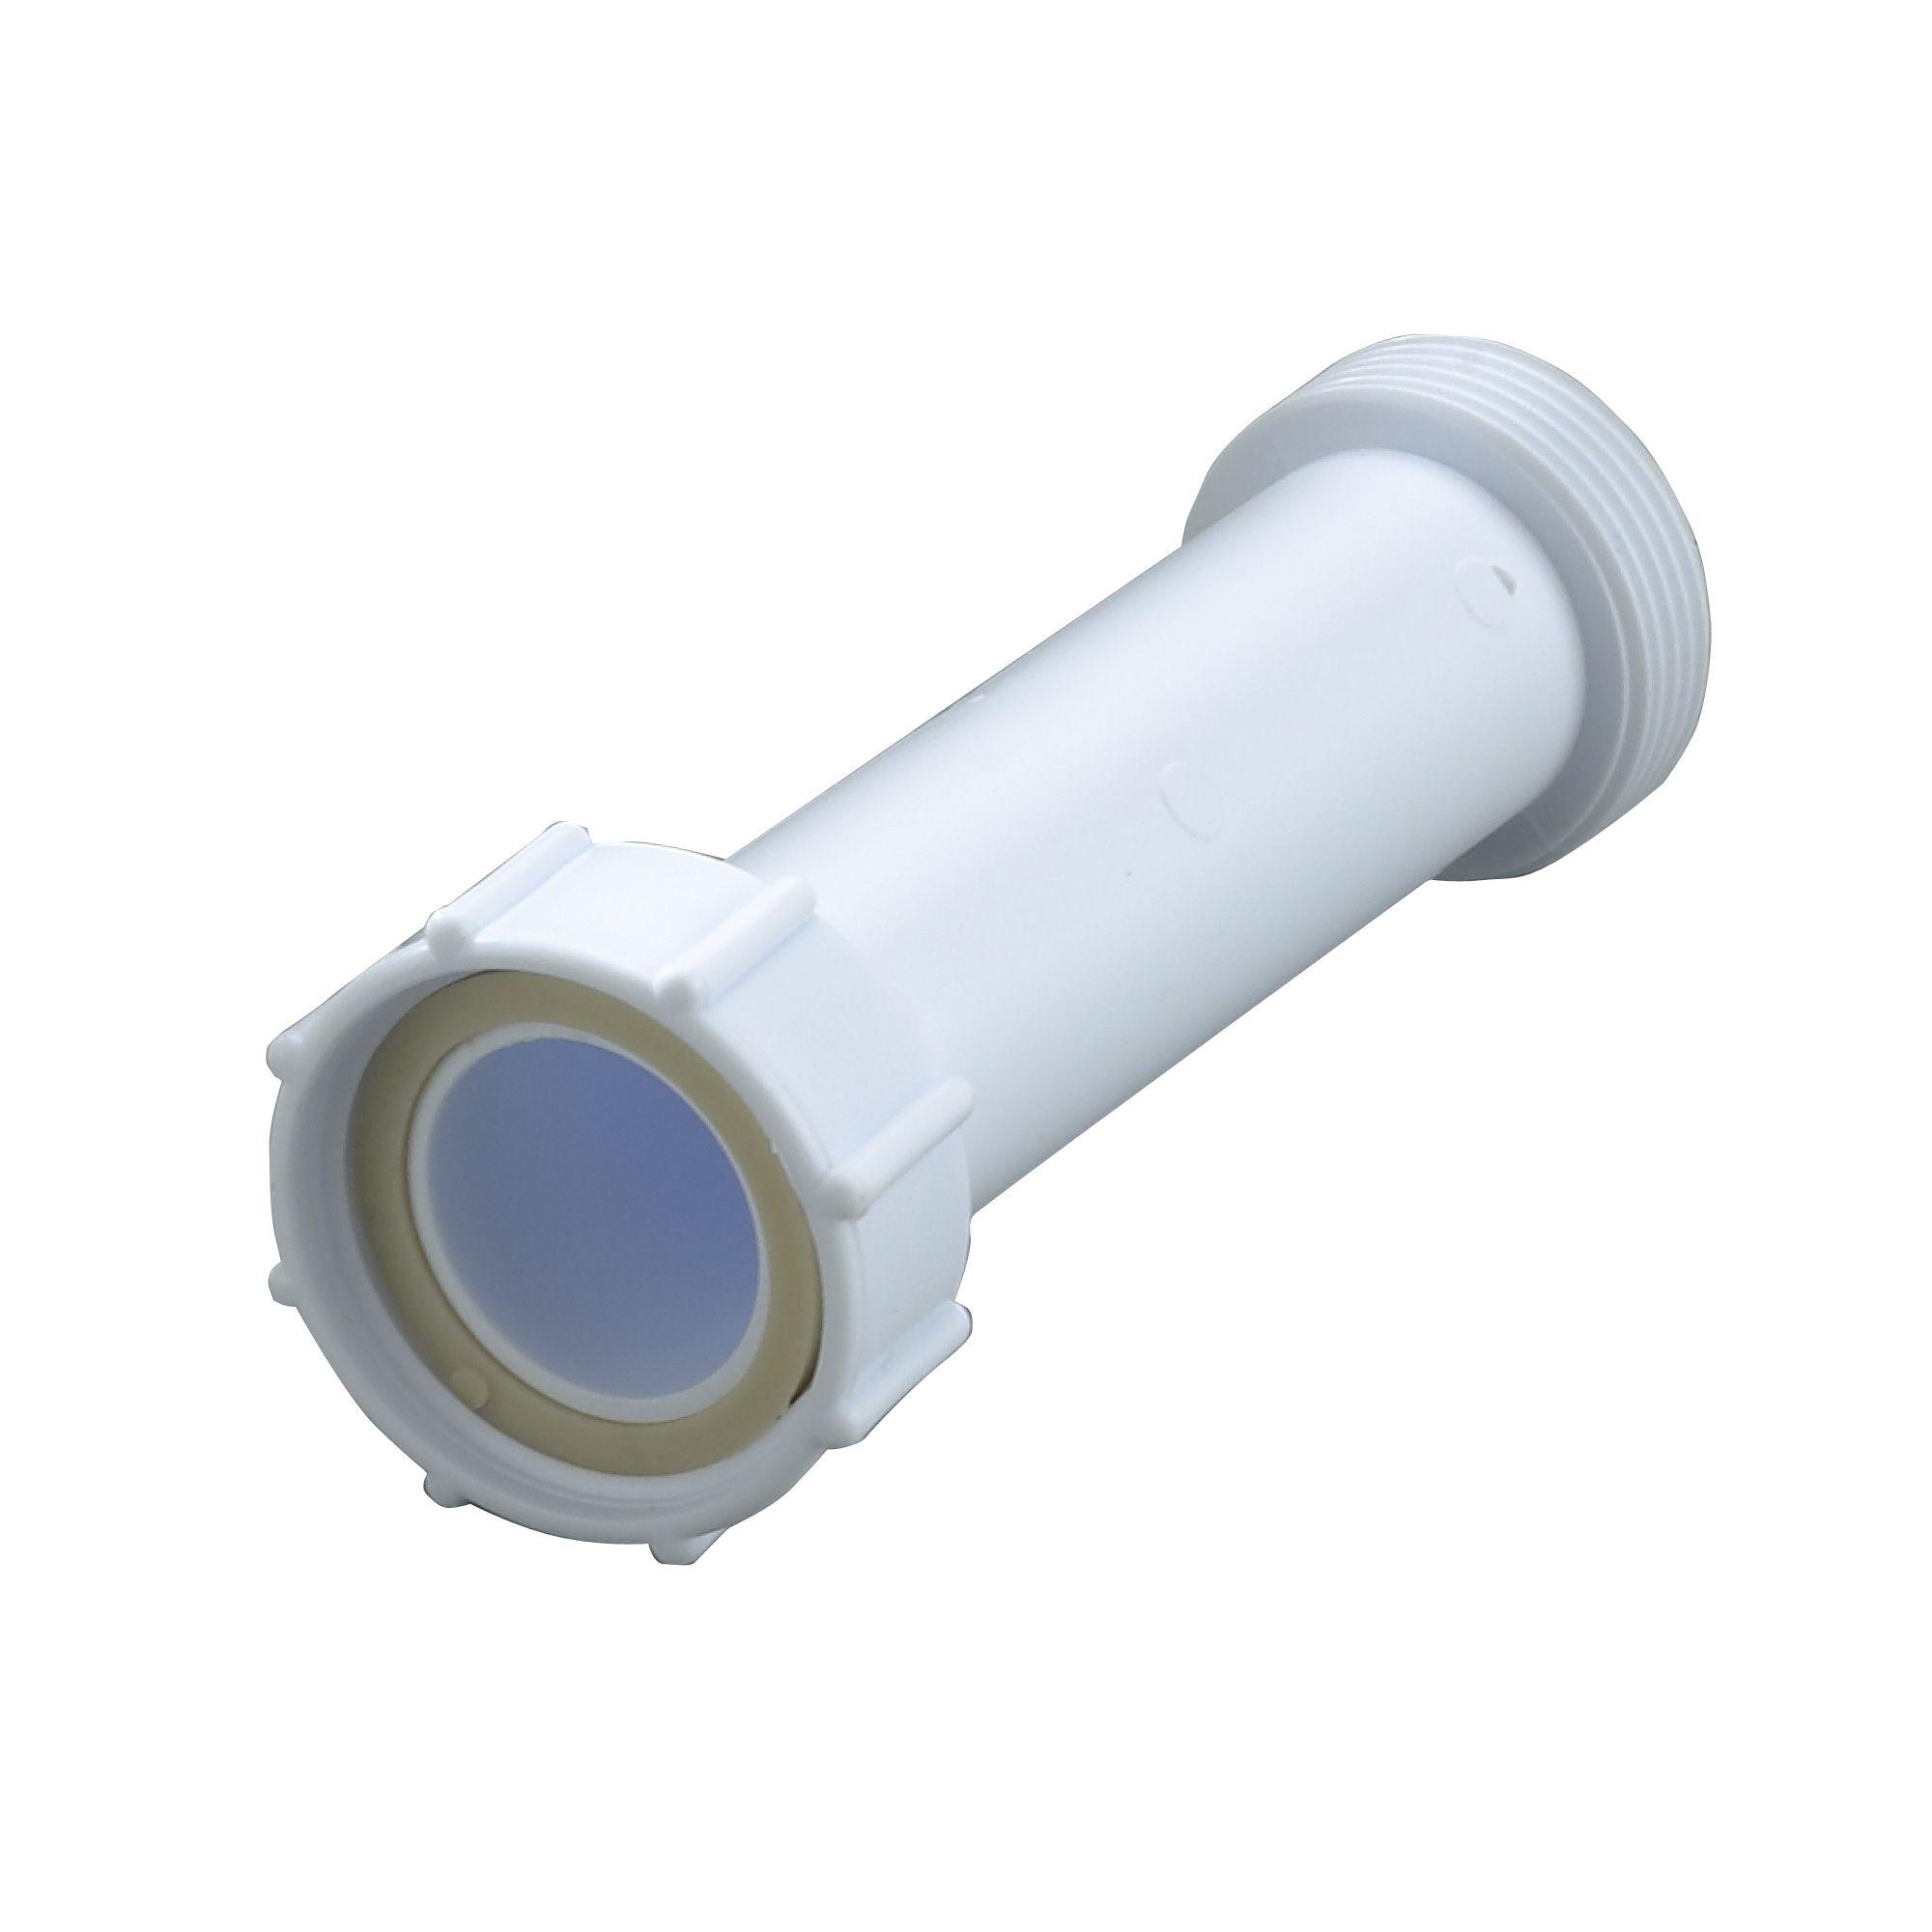 Floplast Waste Trap Height Adjustor (dia)32mm